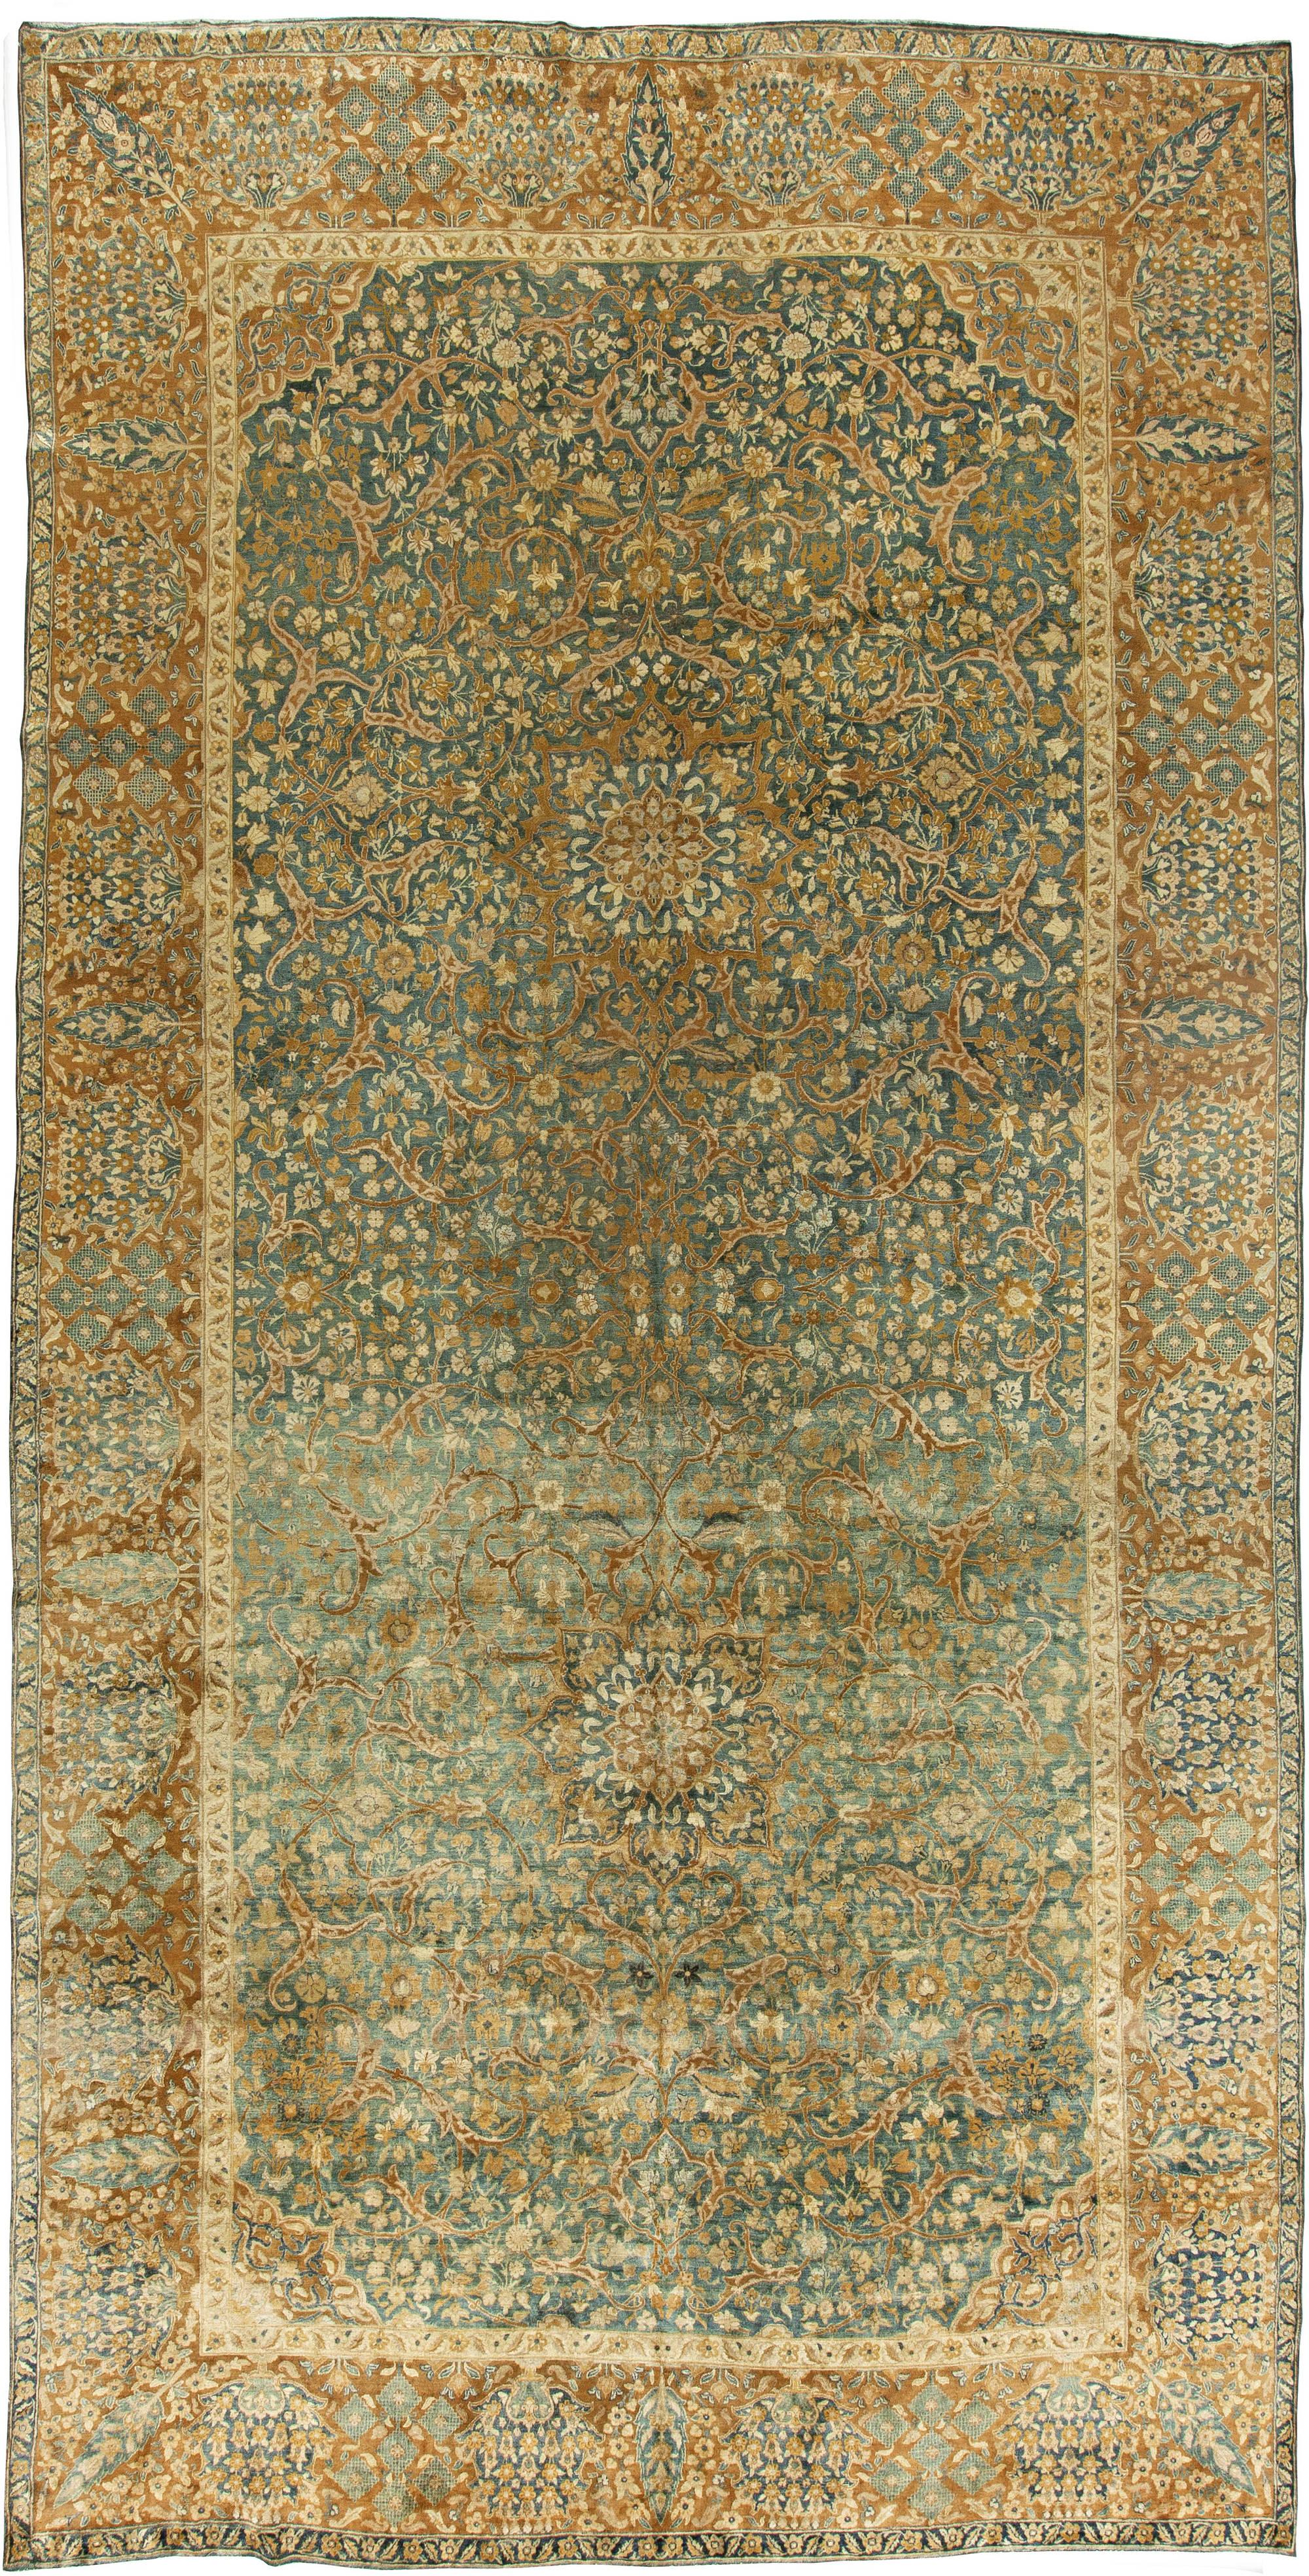 Antique Persian Kirman Rug BB5921